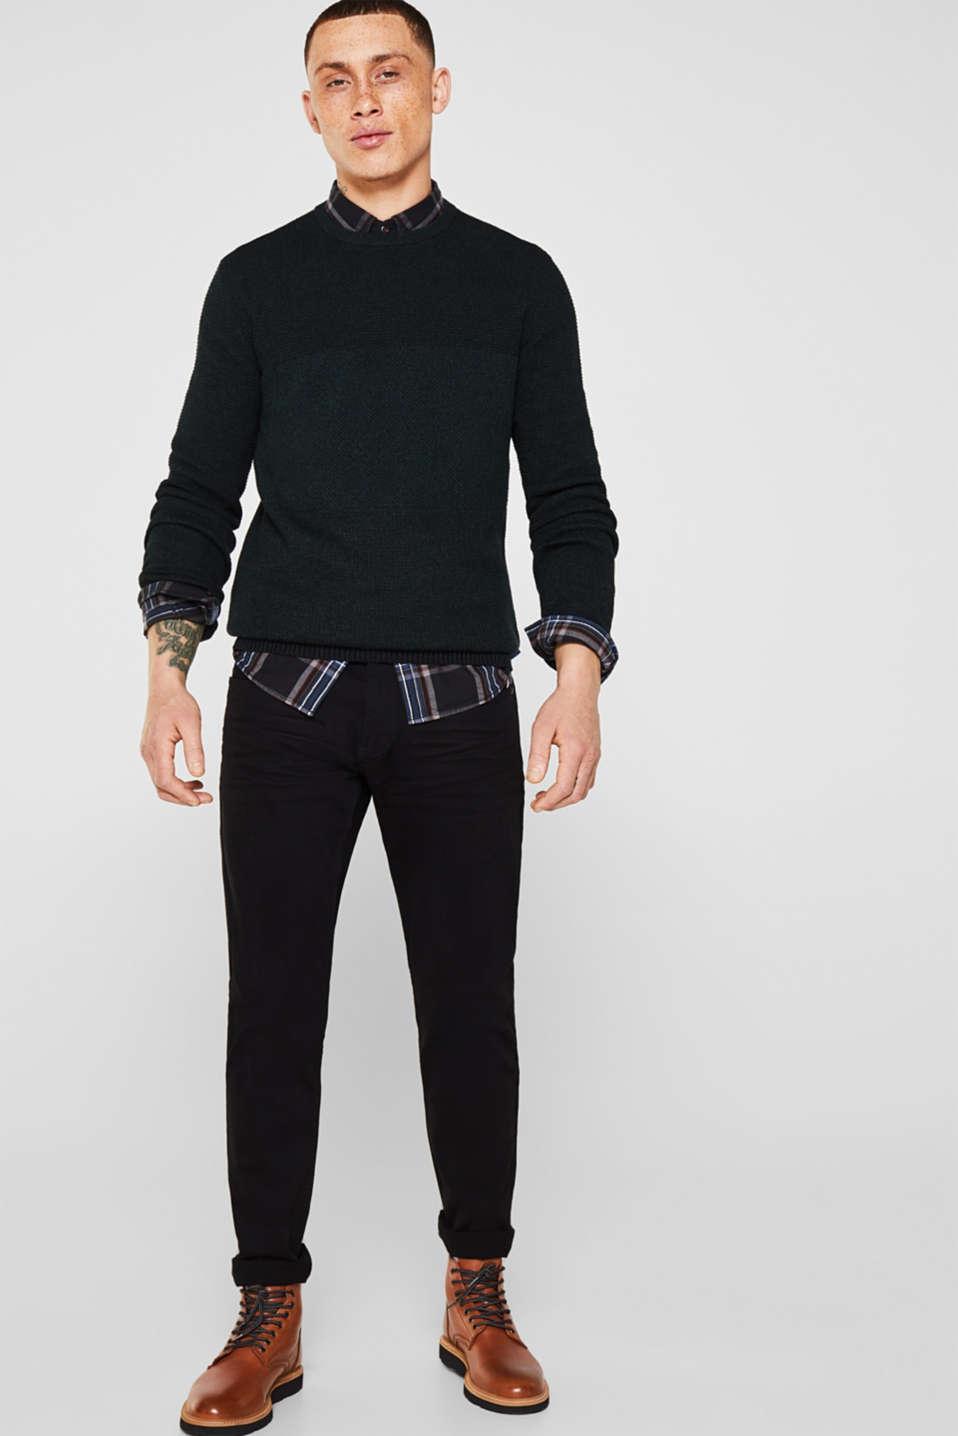 Jumper with textured stripes, 100% cotton, DARK GREEN, detail image number 1